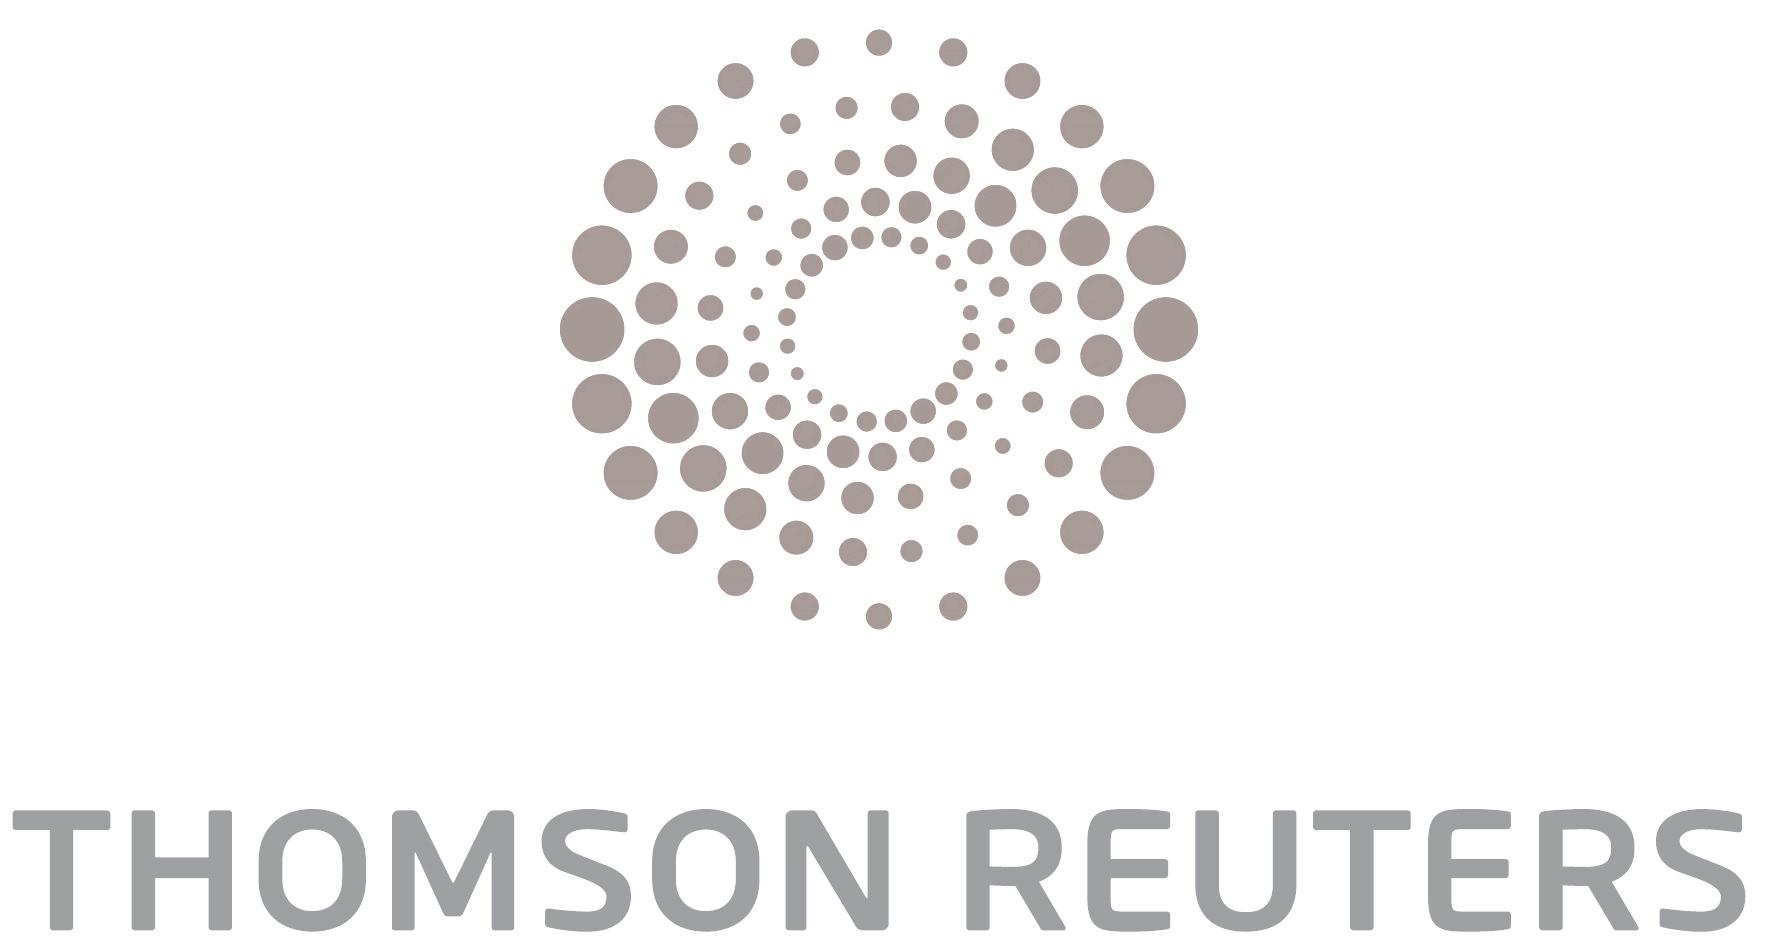 thomson-reuters-logo-e1361322130580.png